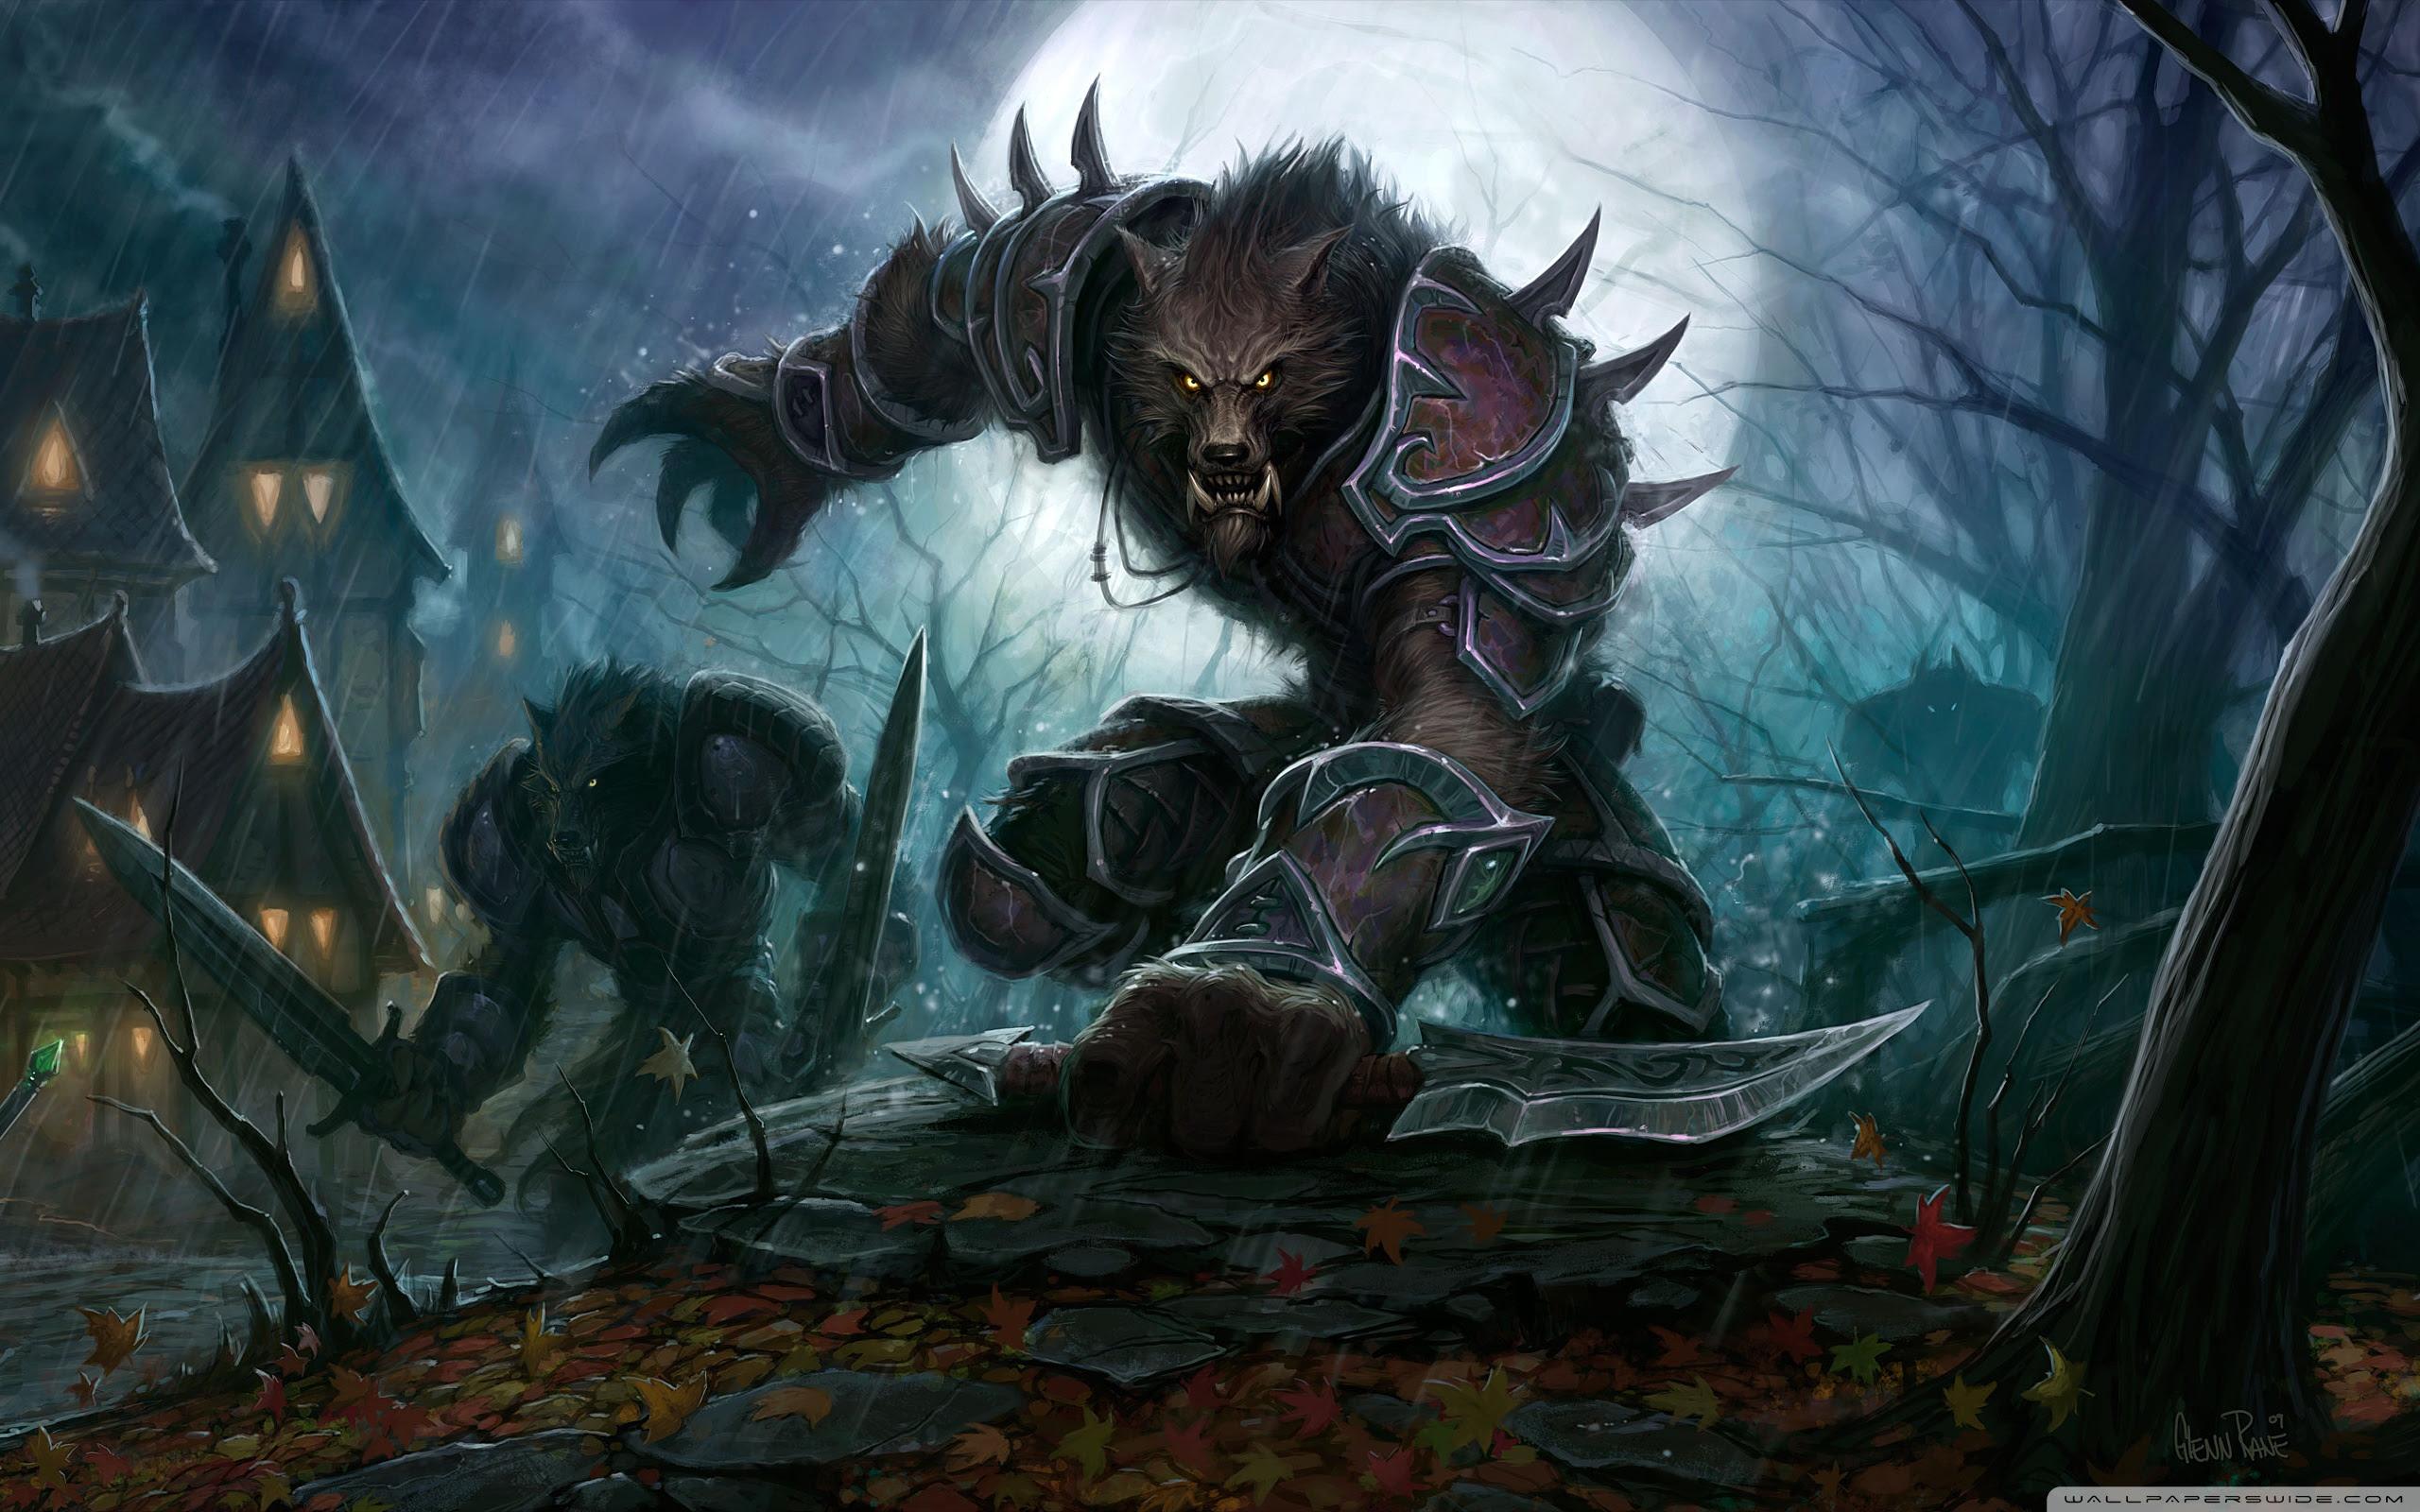 World Of Warcraft Hd Wallpaper 2560x1600 25910